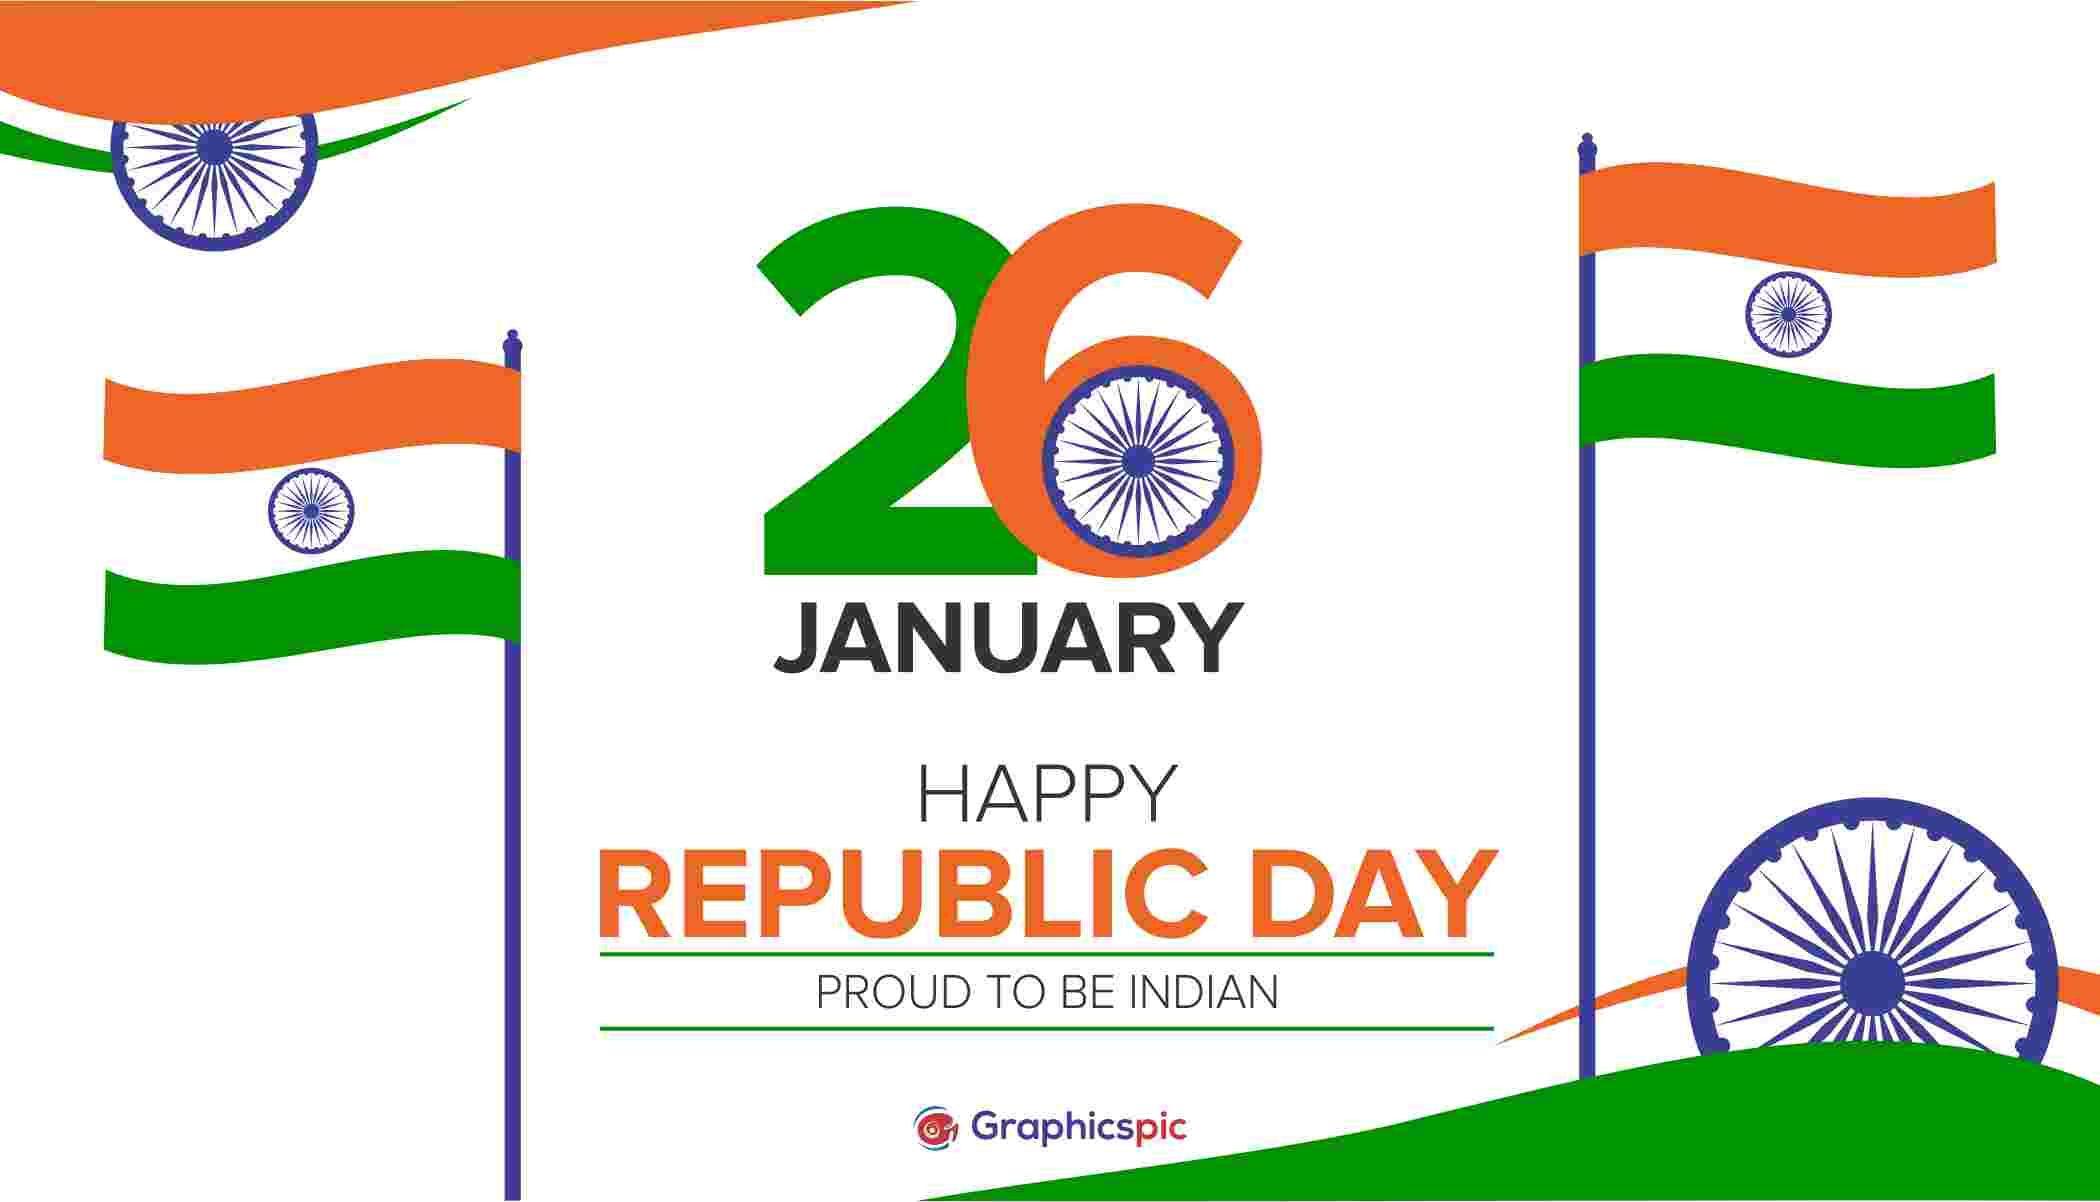 Republic Day 26 January Republic Day Republic Day